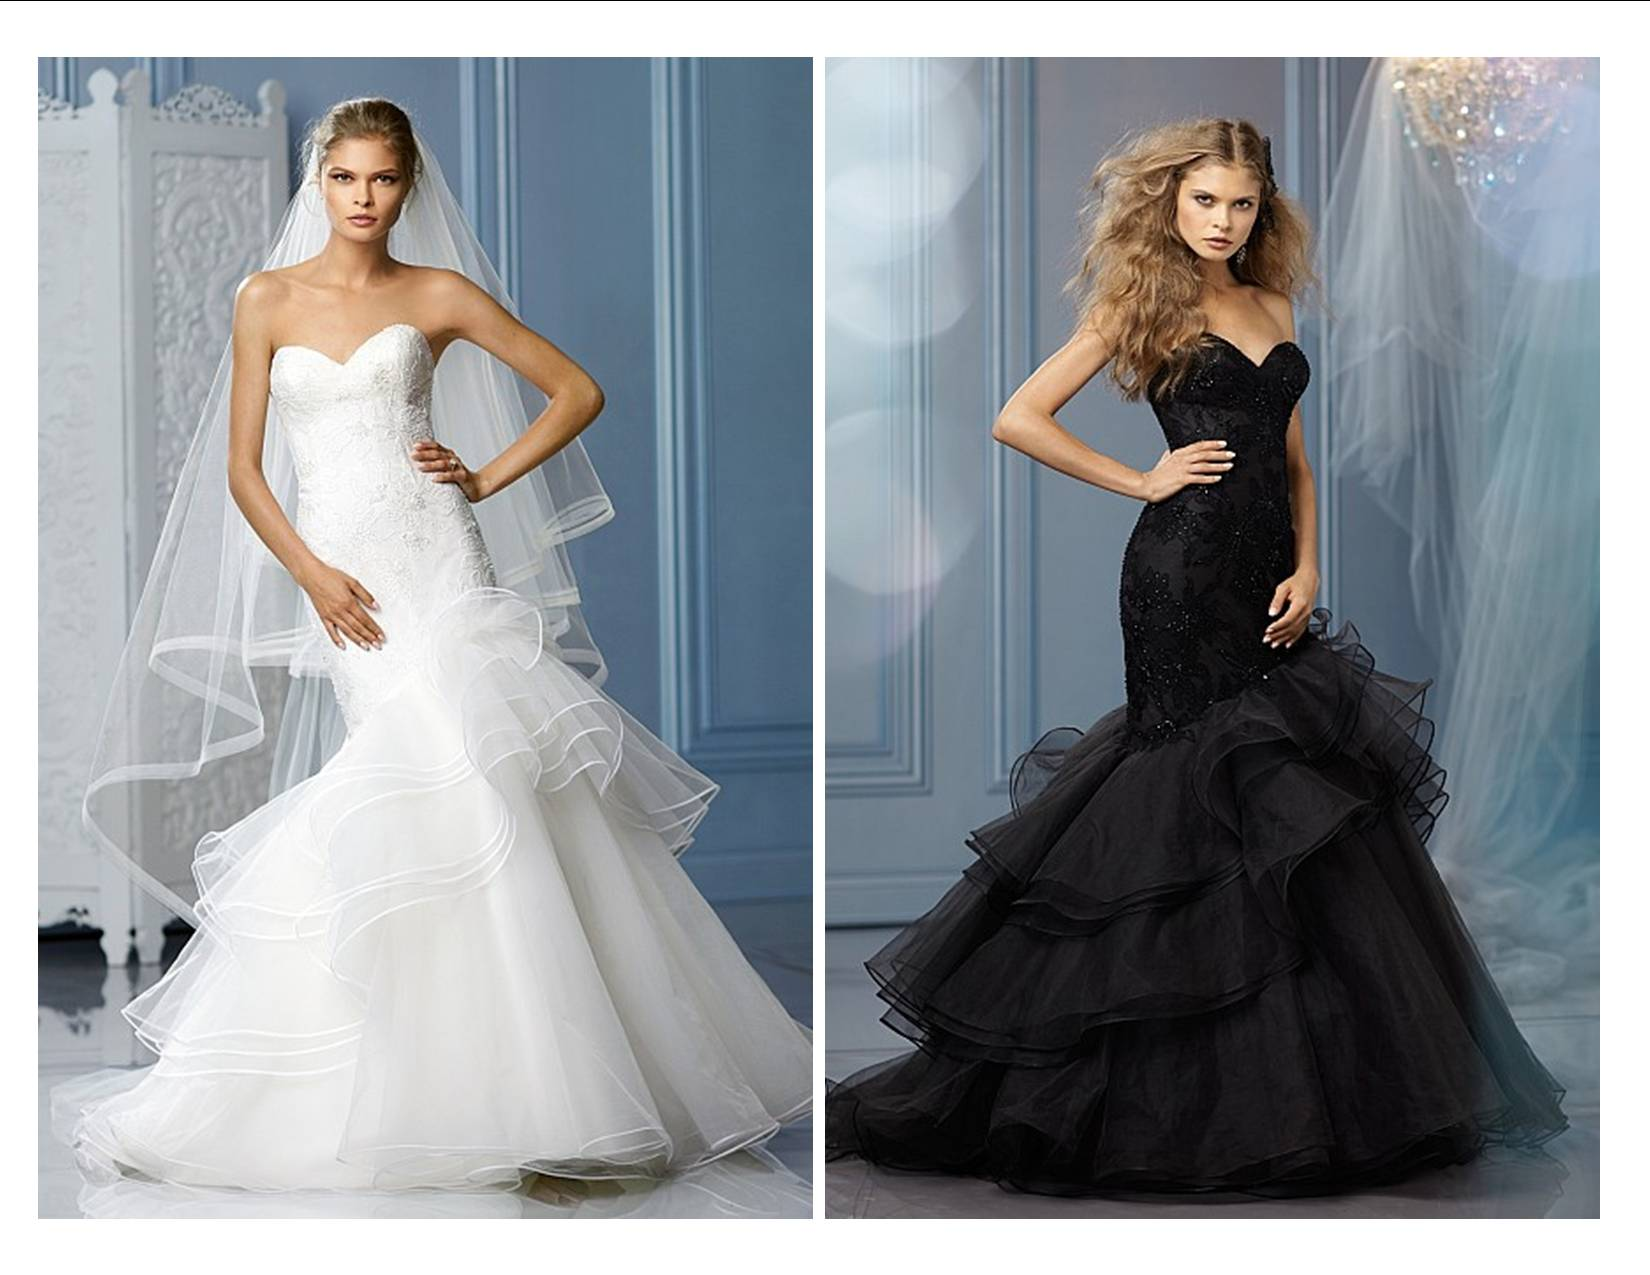 Wedding dress | Premier Bride\'s Perfect Dress